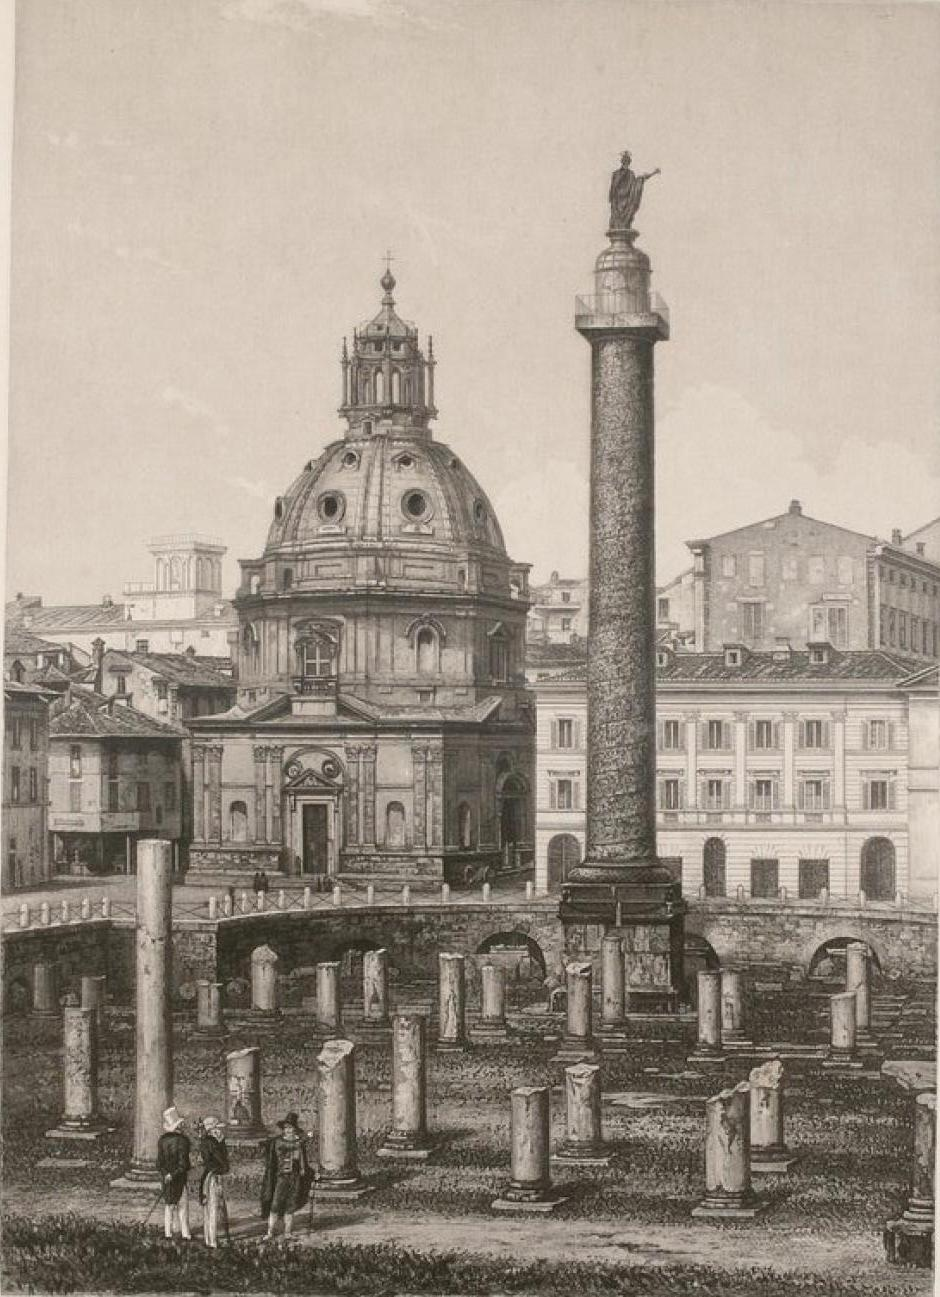 Италия. Рим. Колонна Траяна